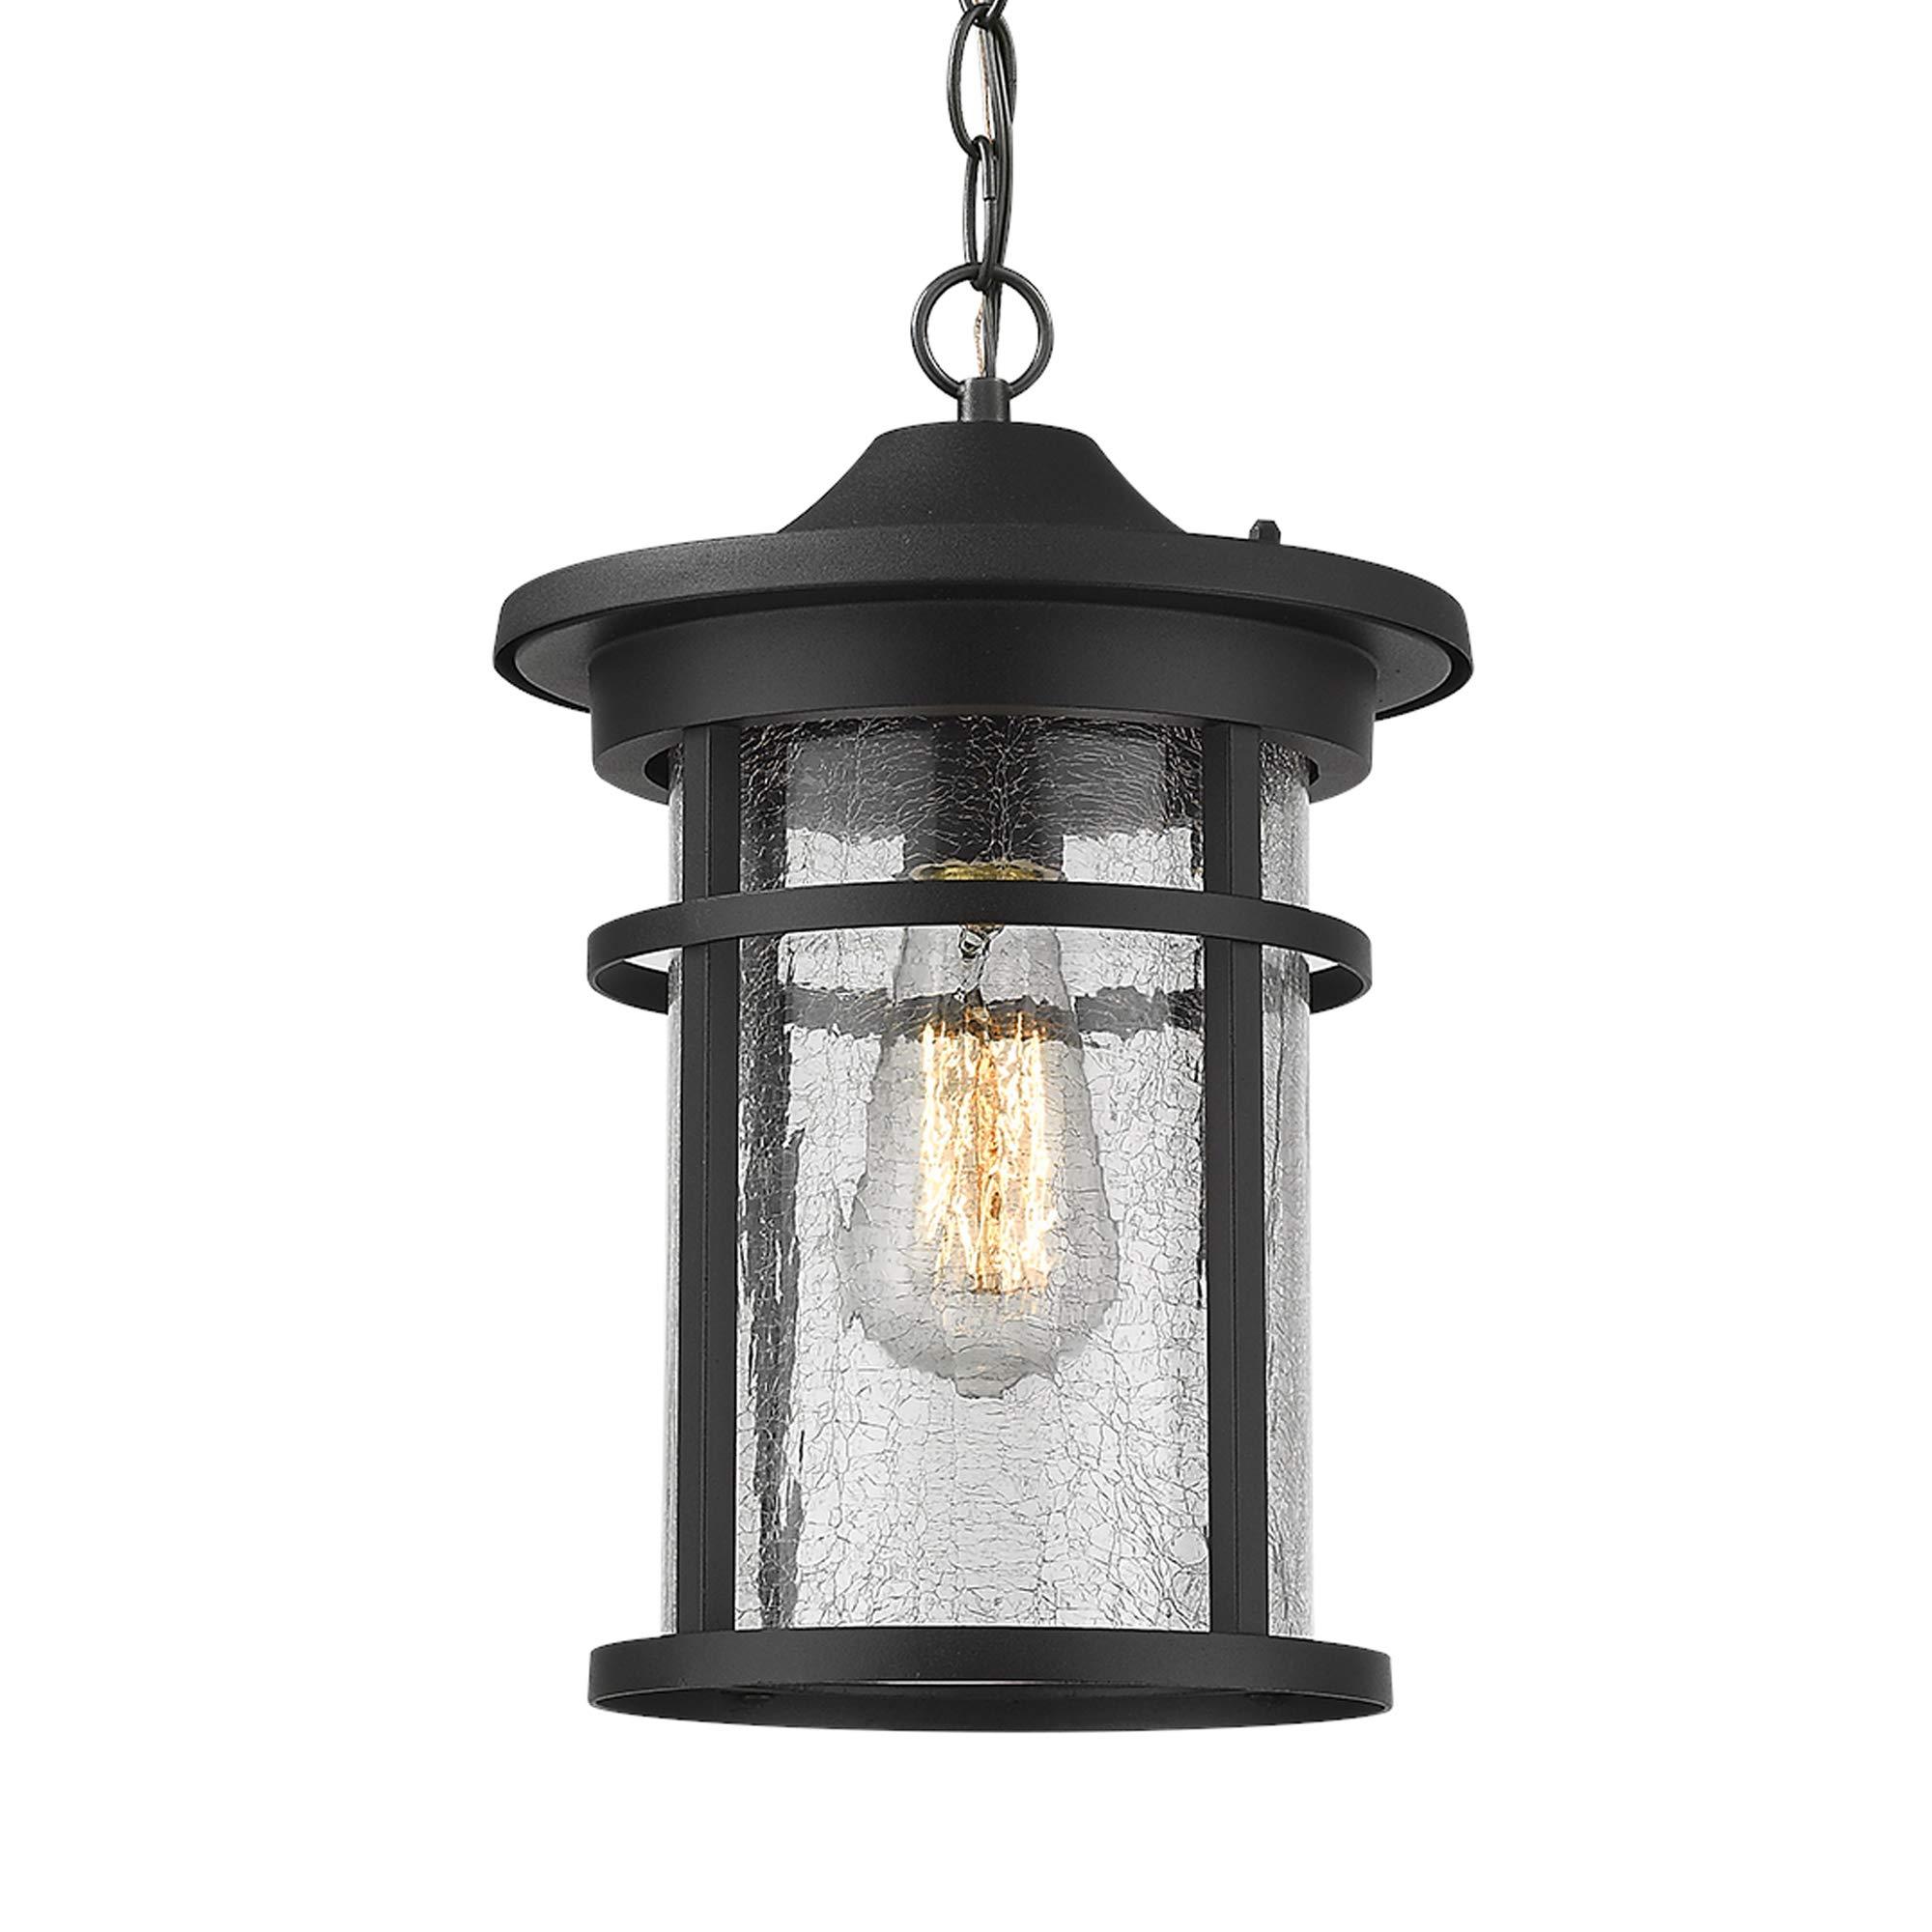 Emliviar Outdoor Hanging Lantern Light Fixture, 1-Light Exterior Pendant Porch Light in Black Finish with Crackle Glass, A208511D1 by EMLIVIAR